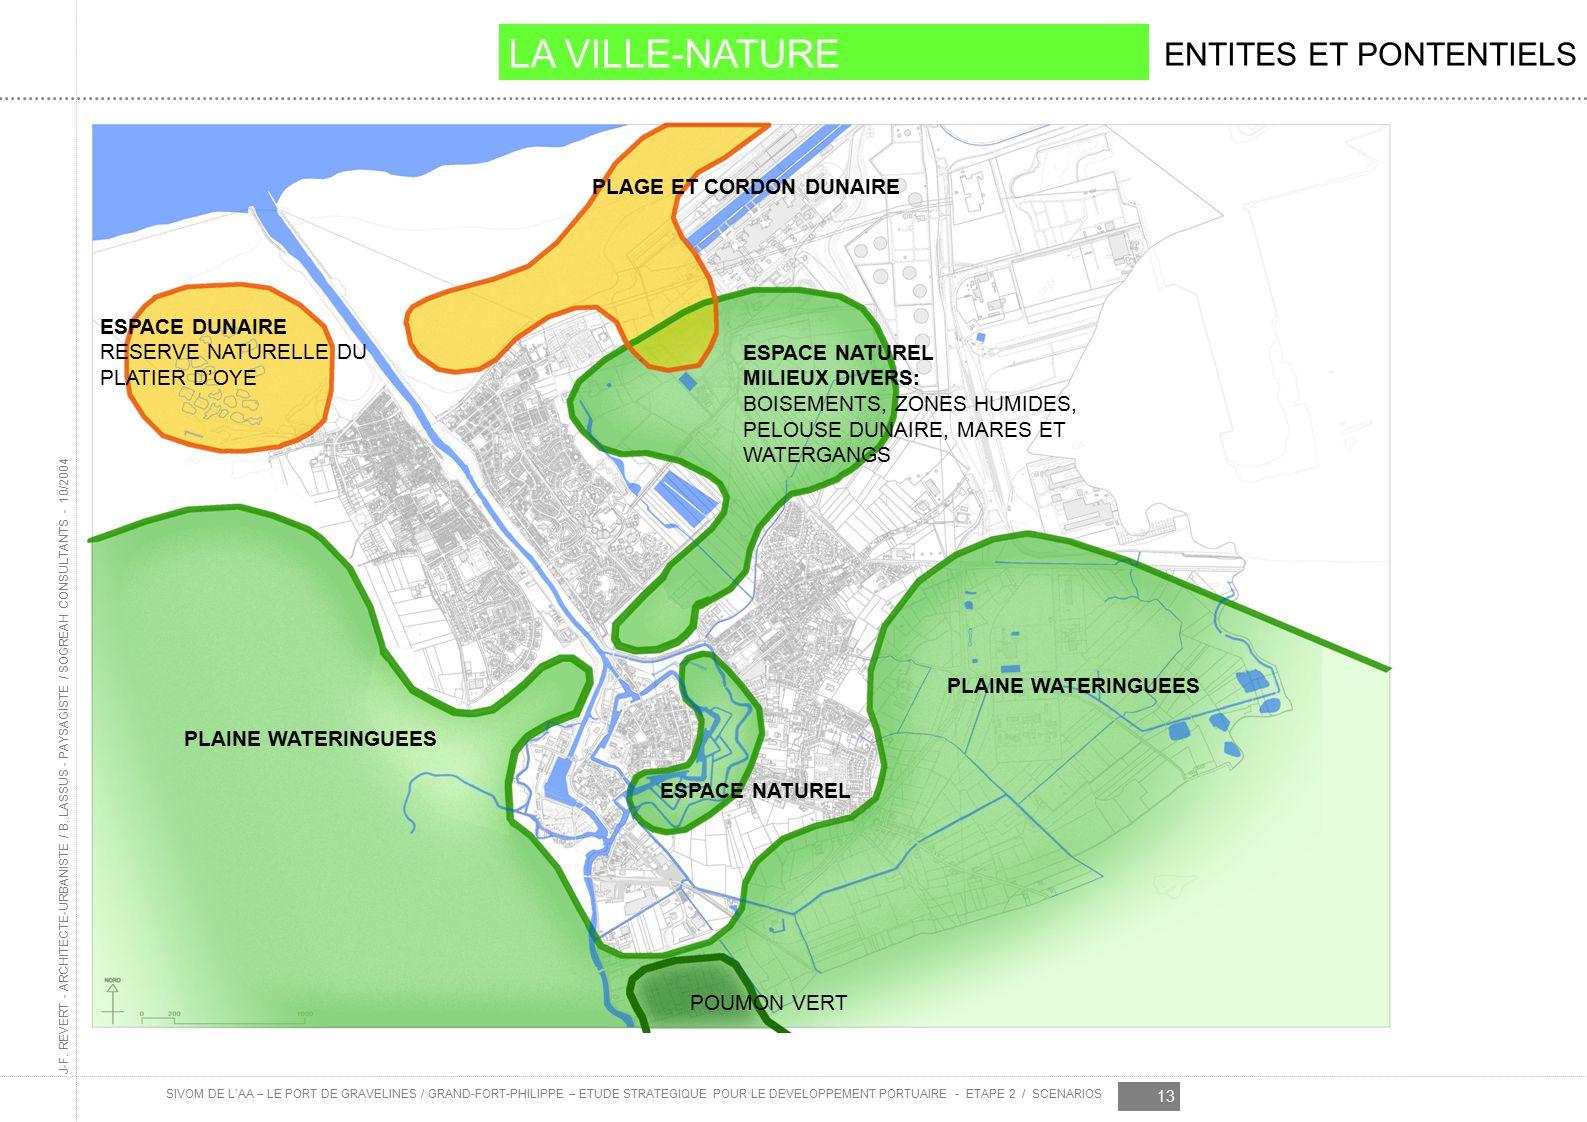 Scenarios le port de gravelines grand fort philippe ppt for La ville nature